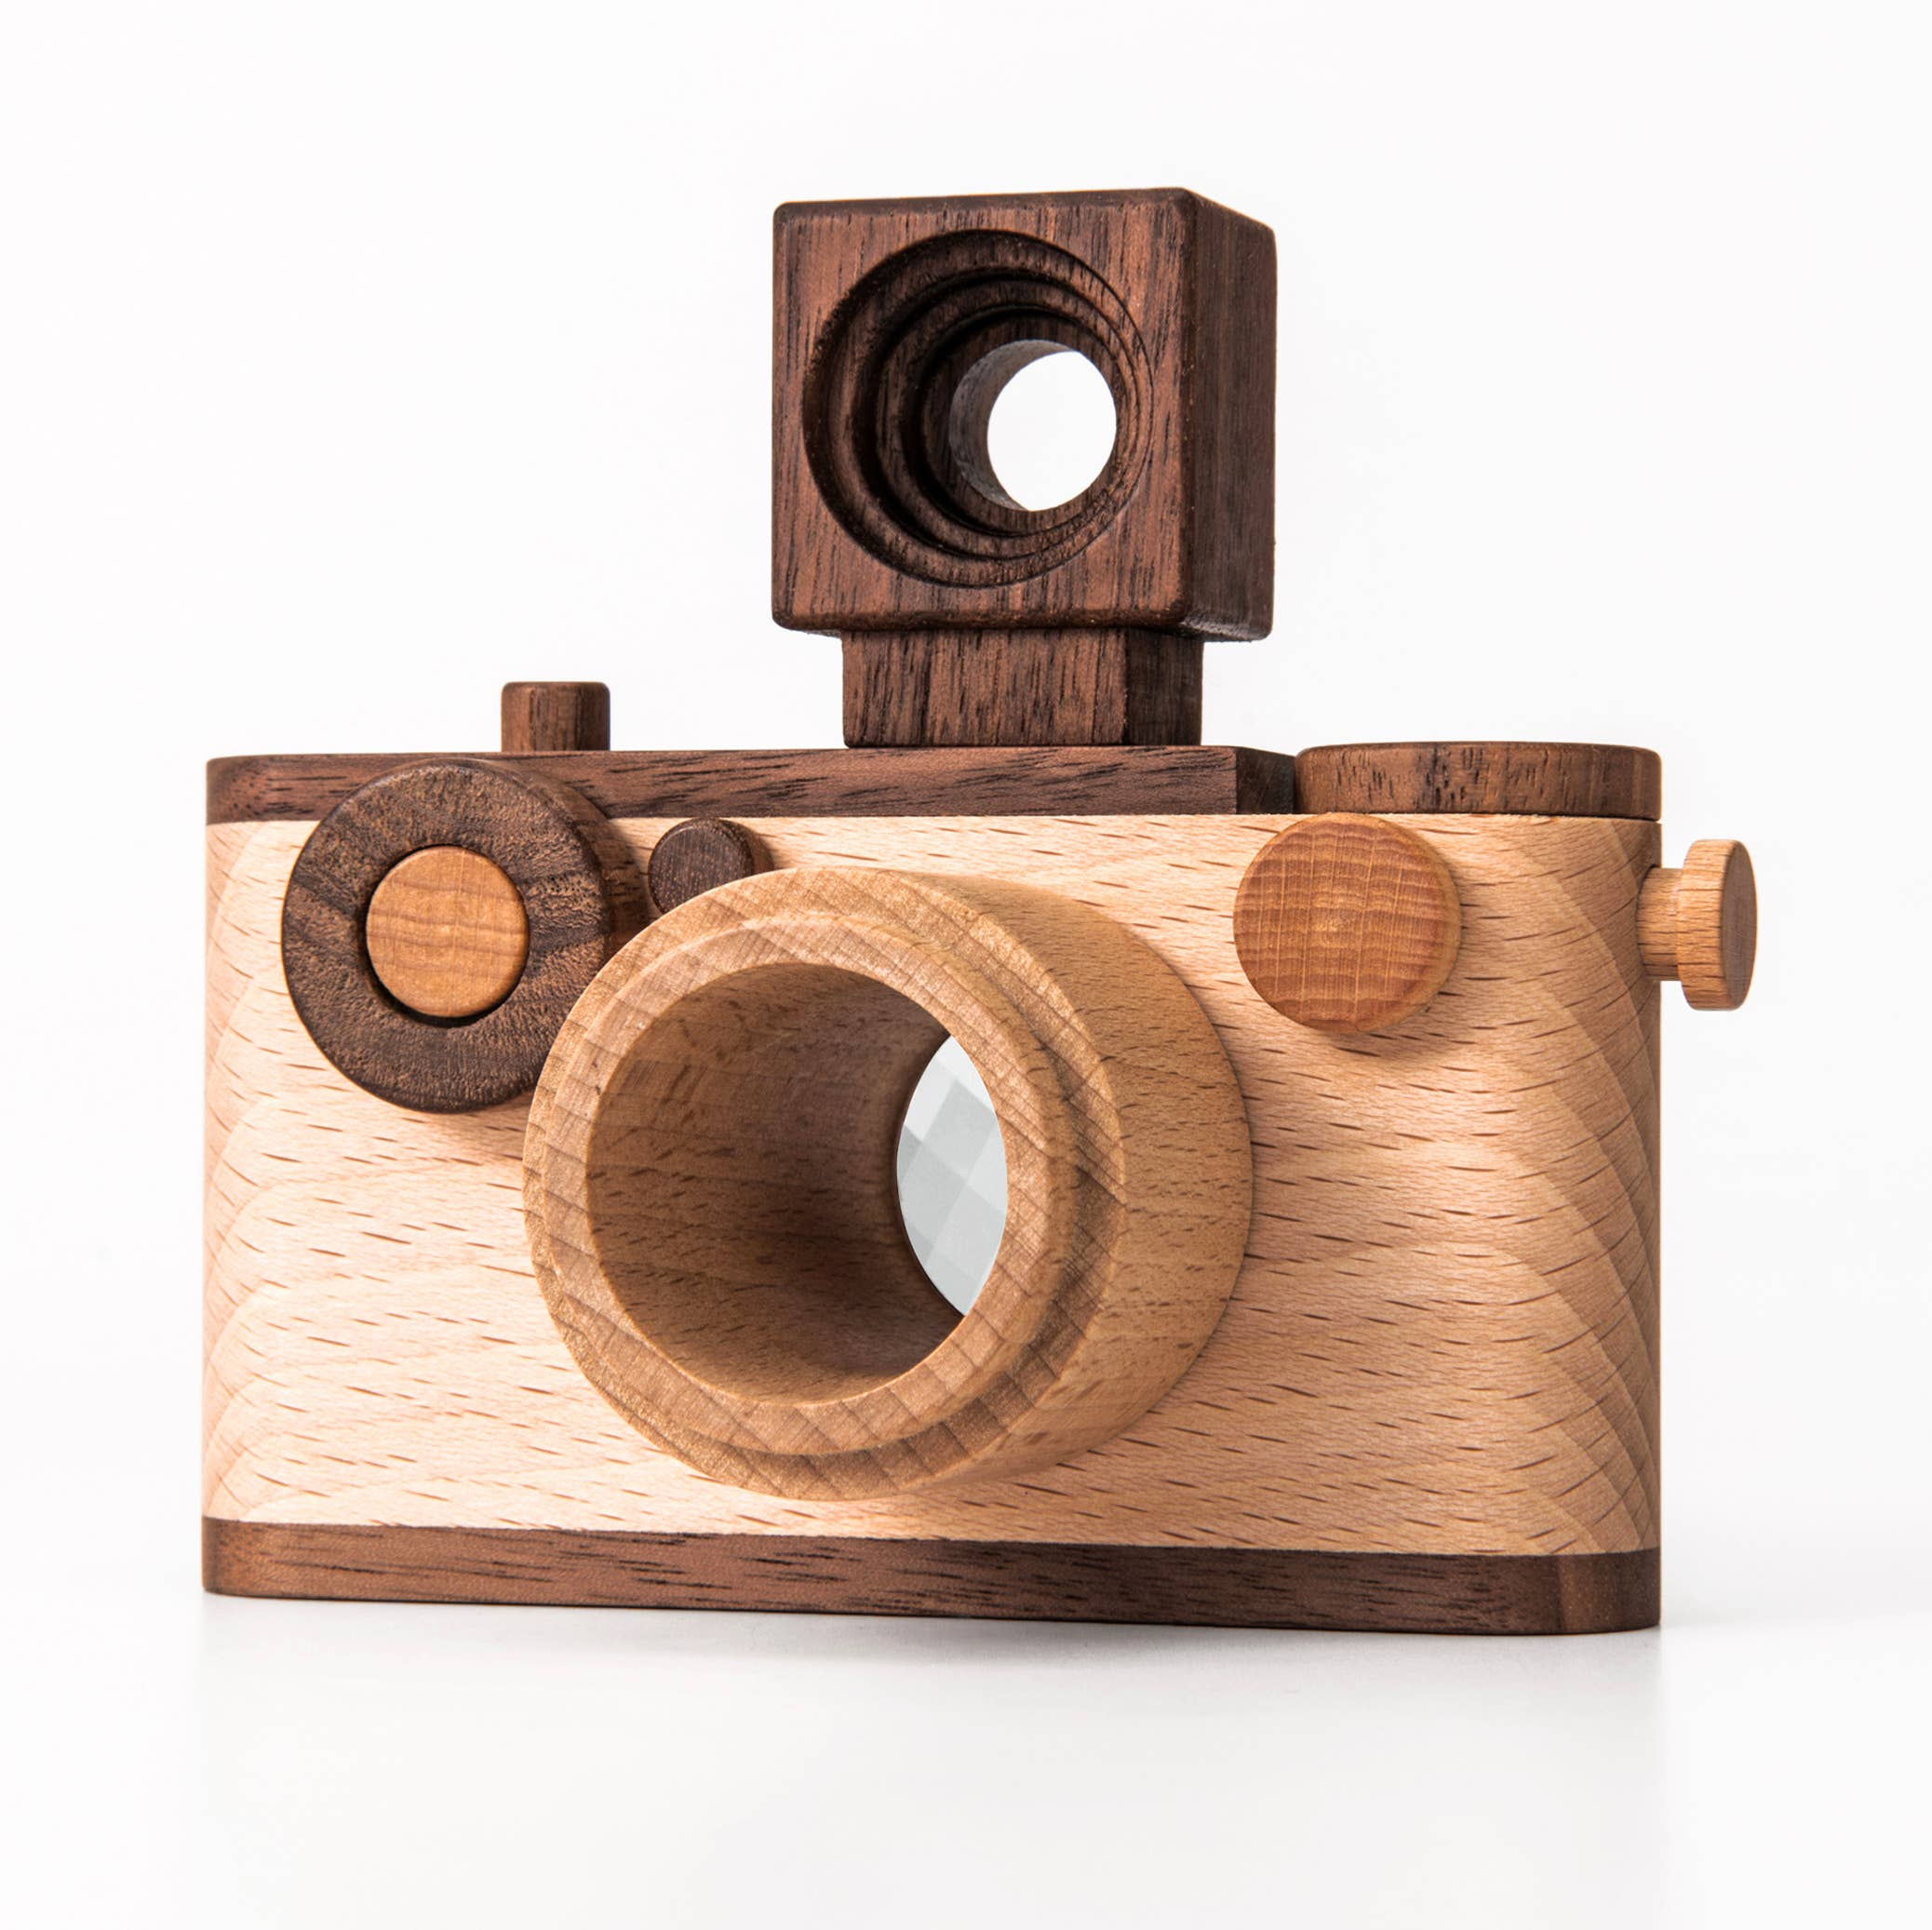 35mm Vintage Style Camera   Trada Marketplace